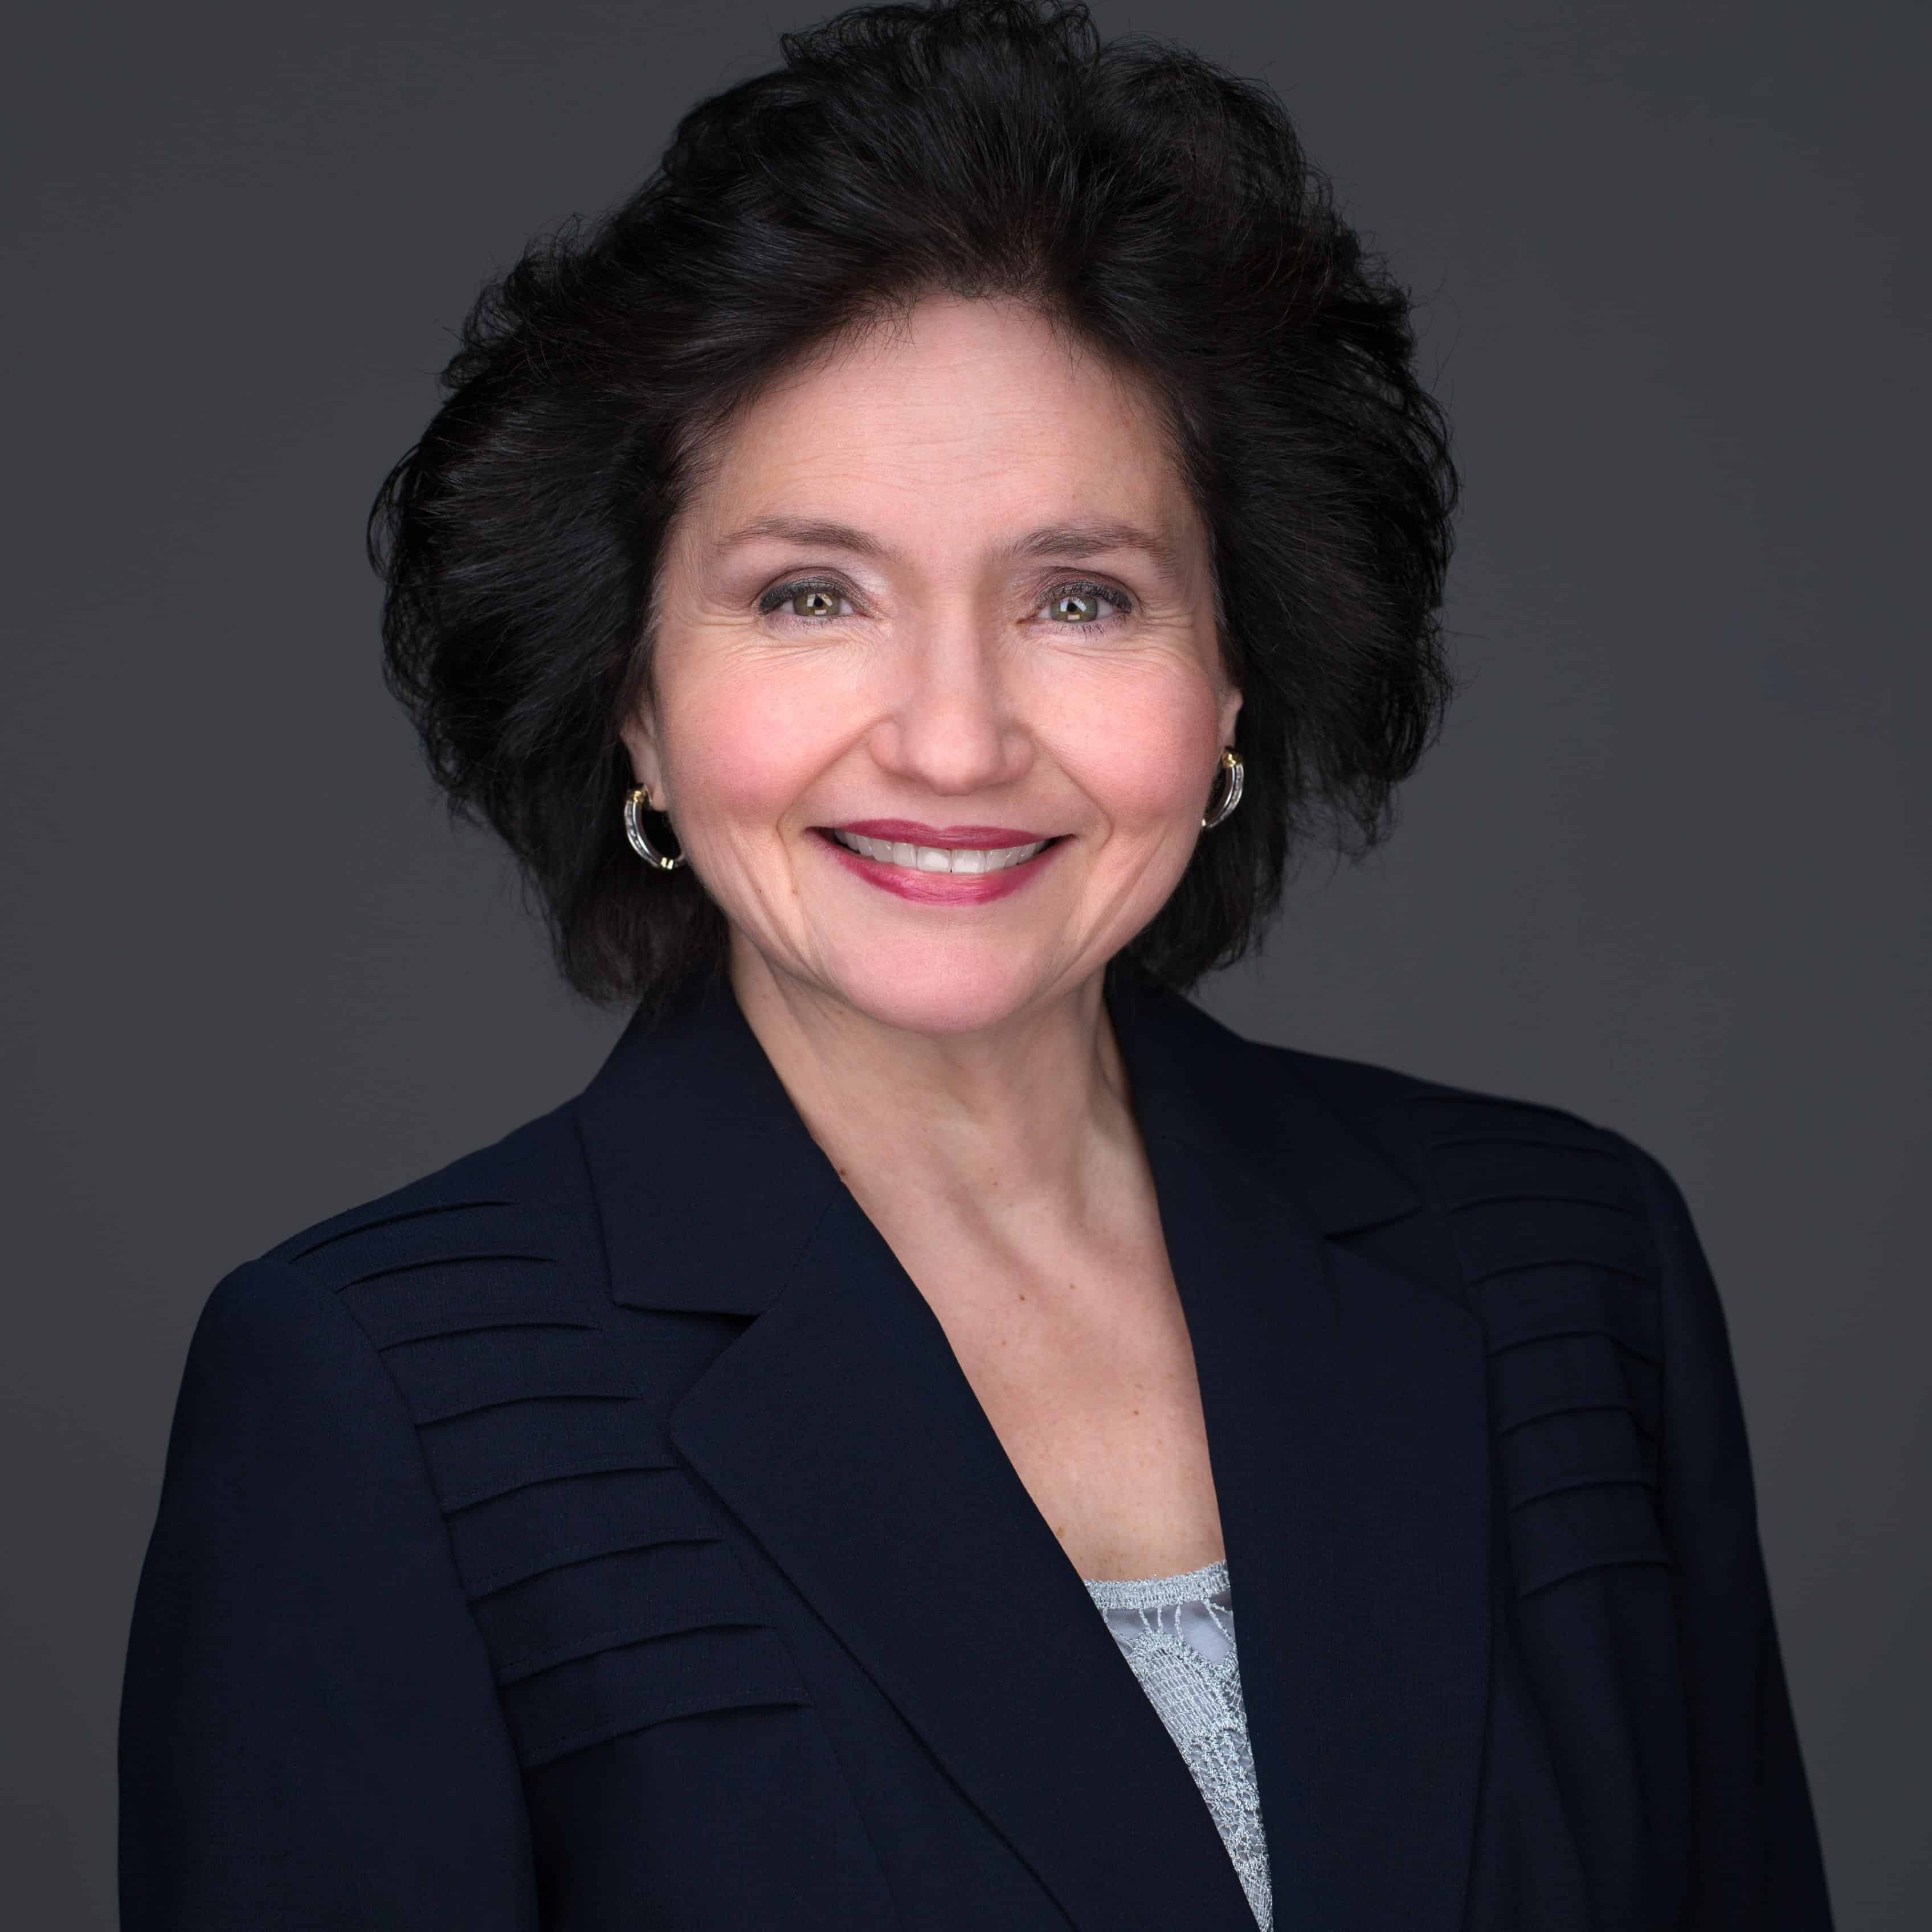 Maria N. Miara